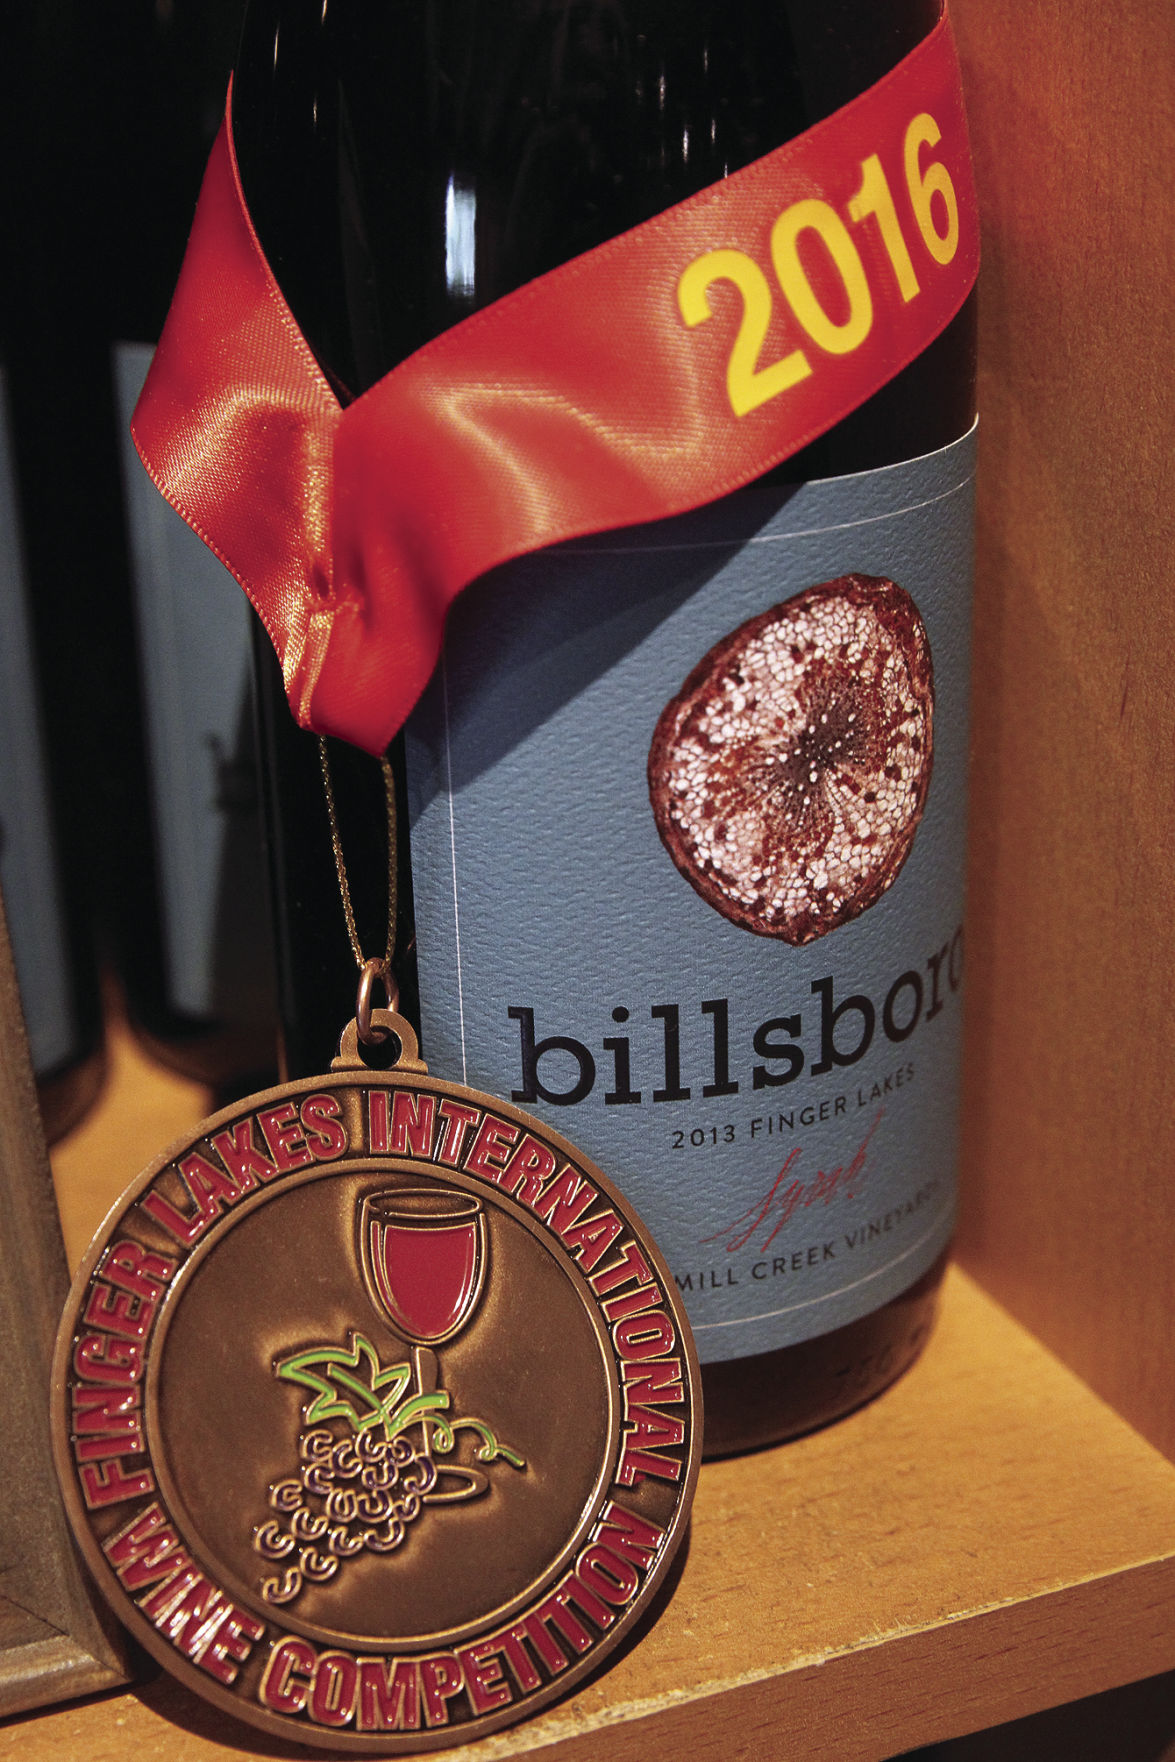 The winning wine